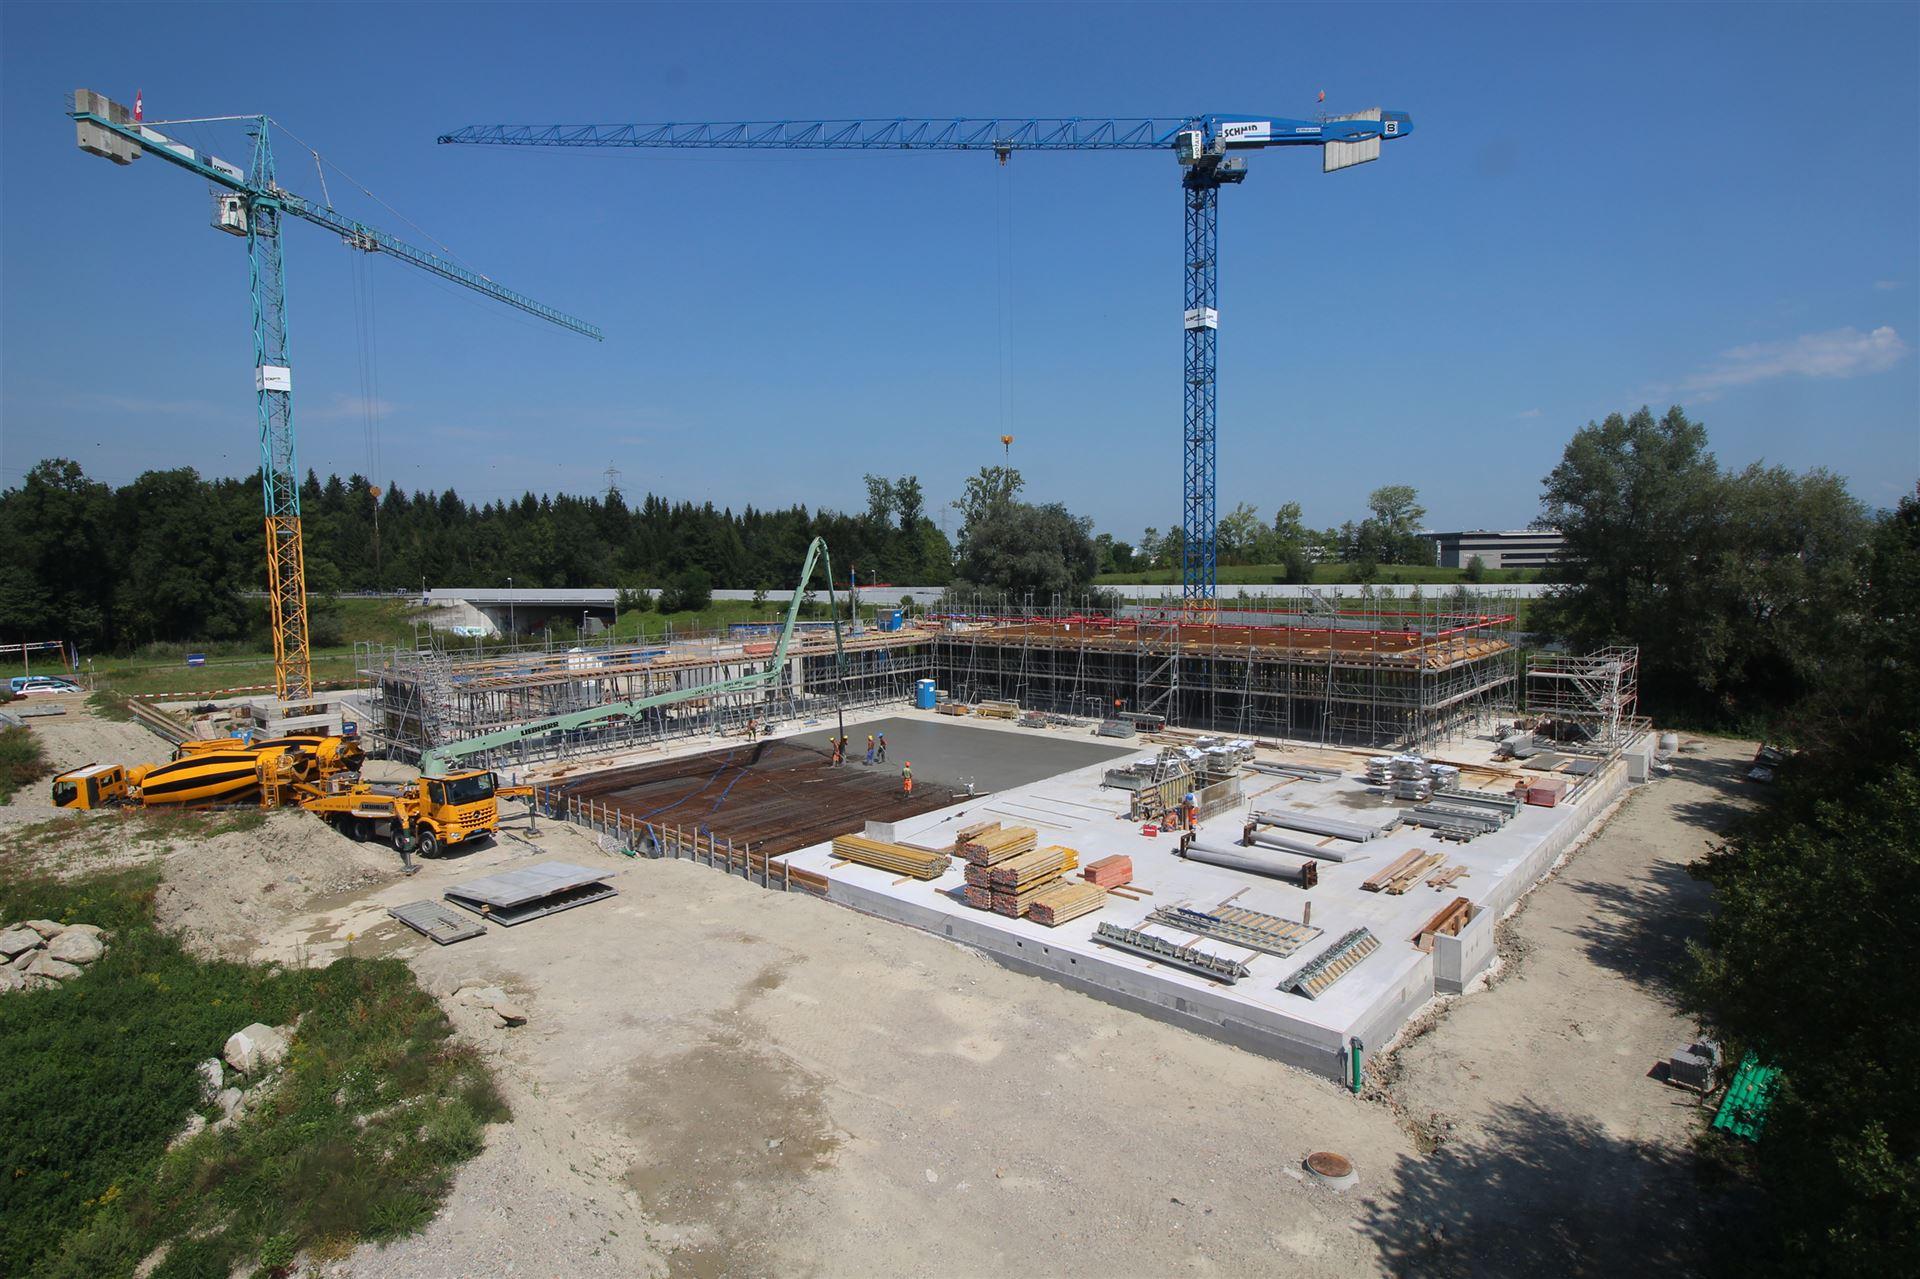 Building Construction Time Lapse Camera